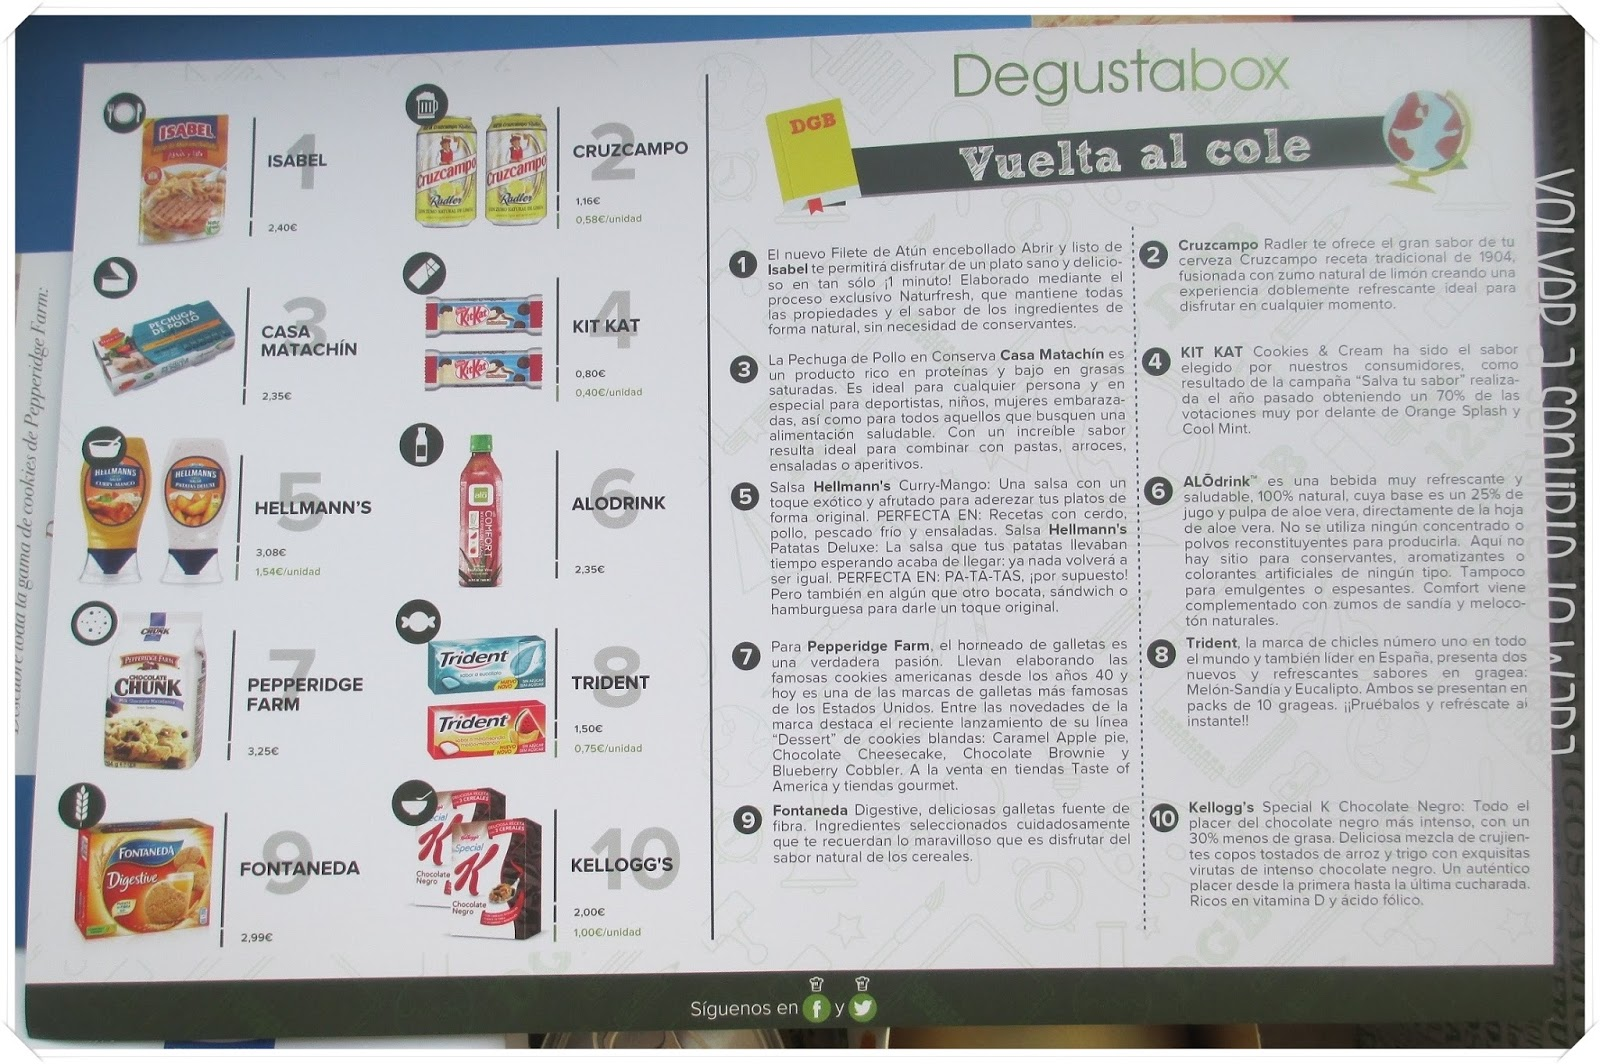 degustabox 'Vuelta al Cole' - Agosto 2014